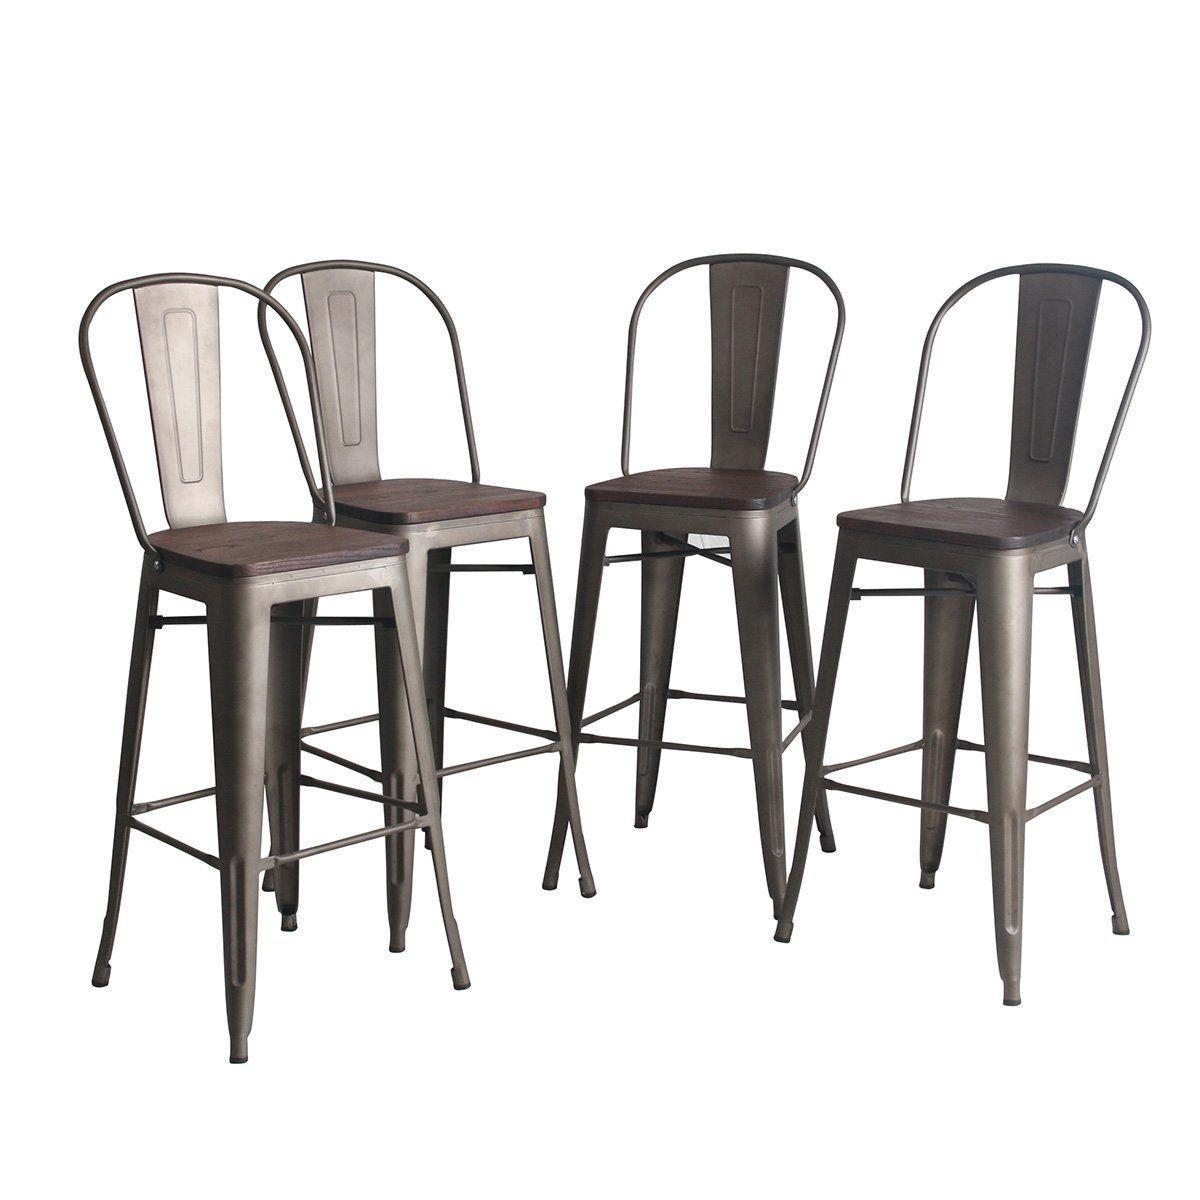 Yongqiang Metal Barstools Set Of 4 Indoor Outdoor Bar Stools High